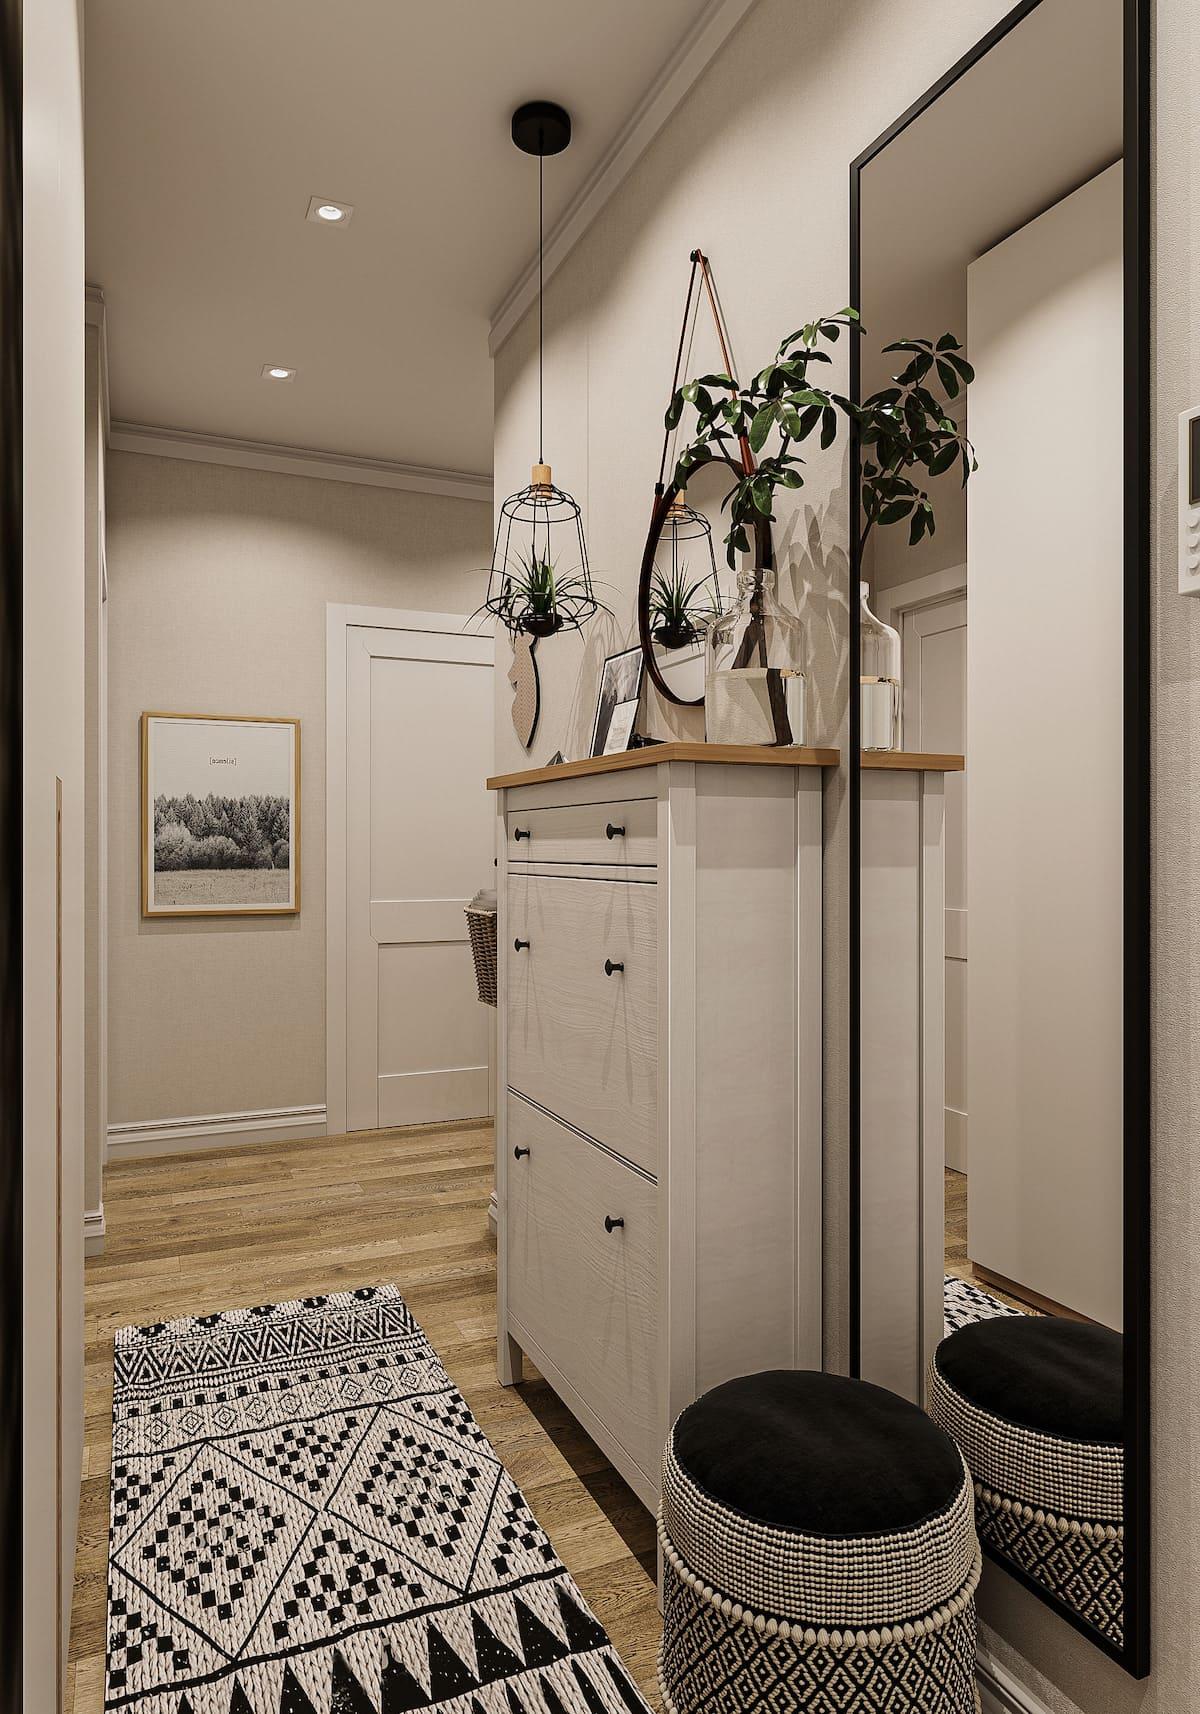 дизайн однокомнатной квартиры фото 41